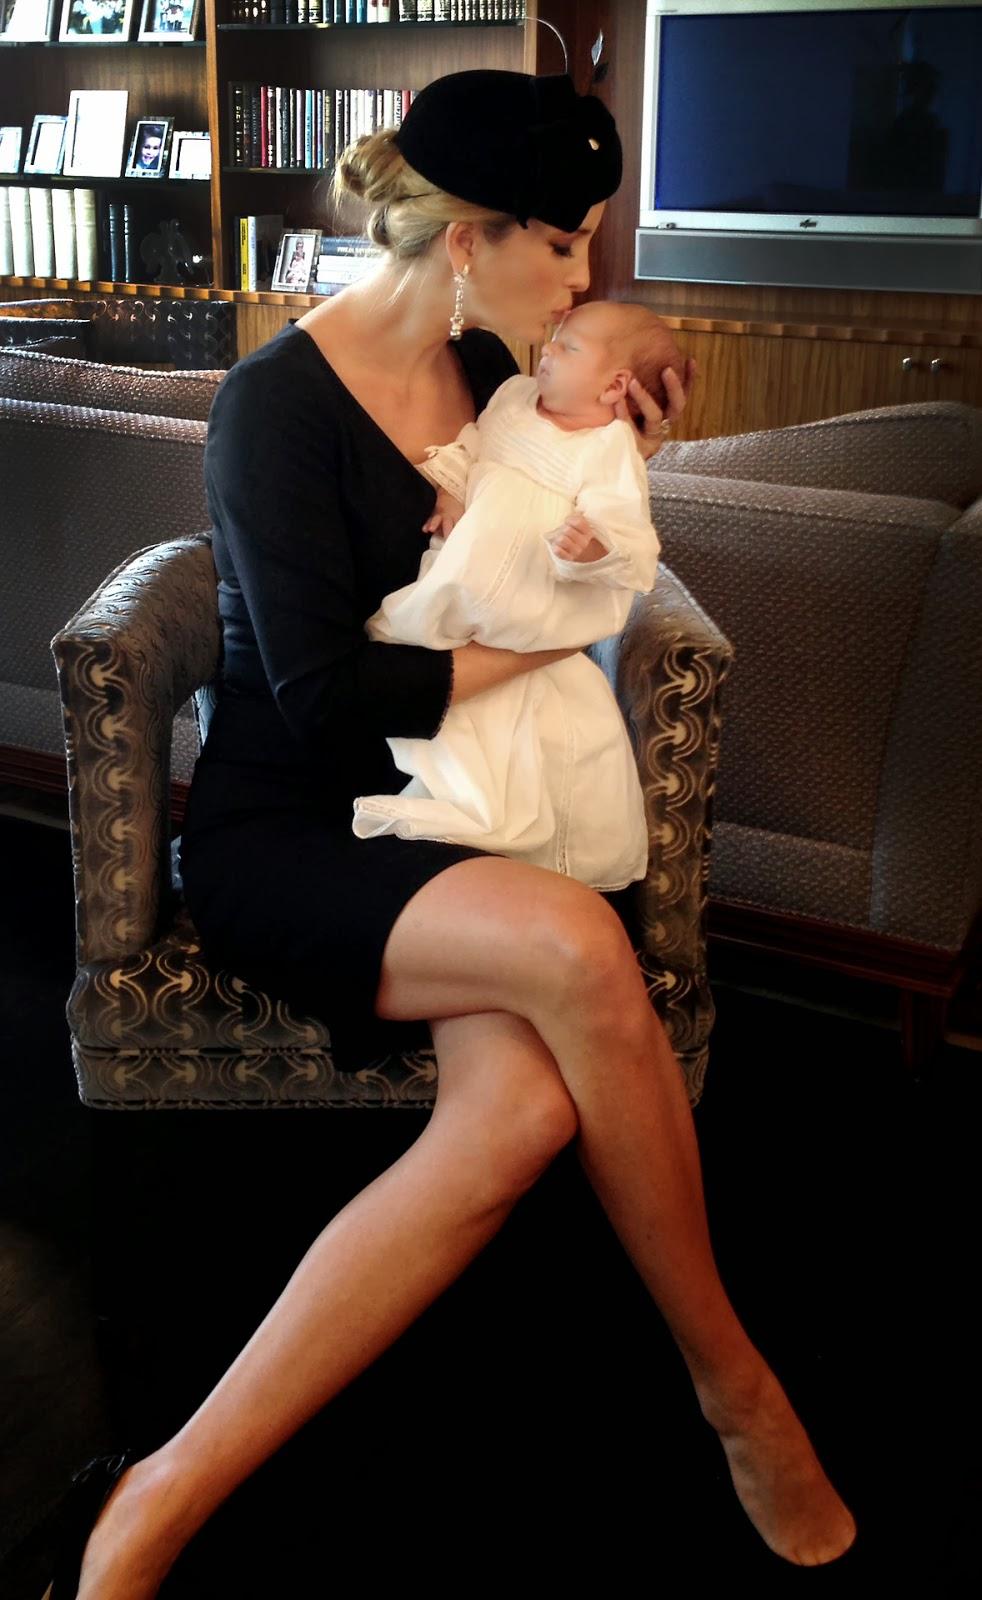 Ivanka Trump Pictures: ivanka Trump Family Life